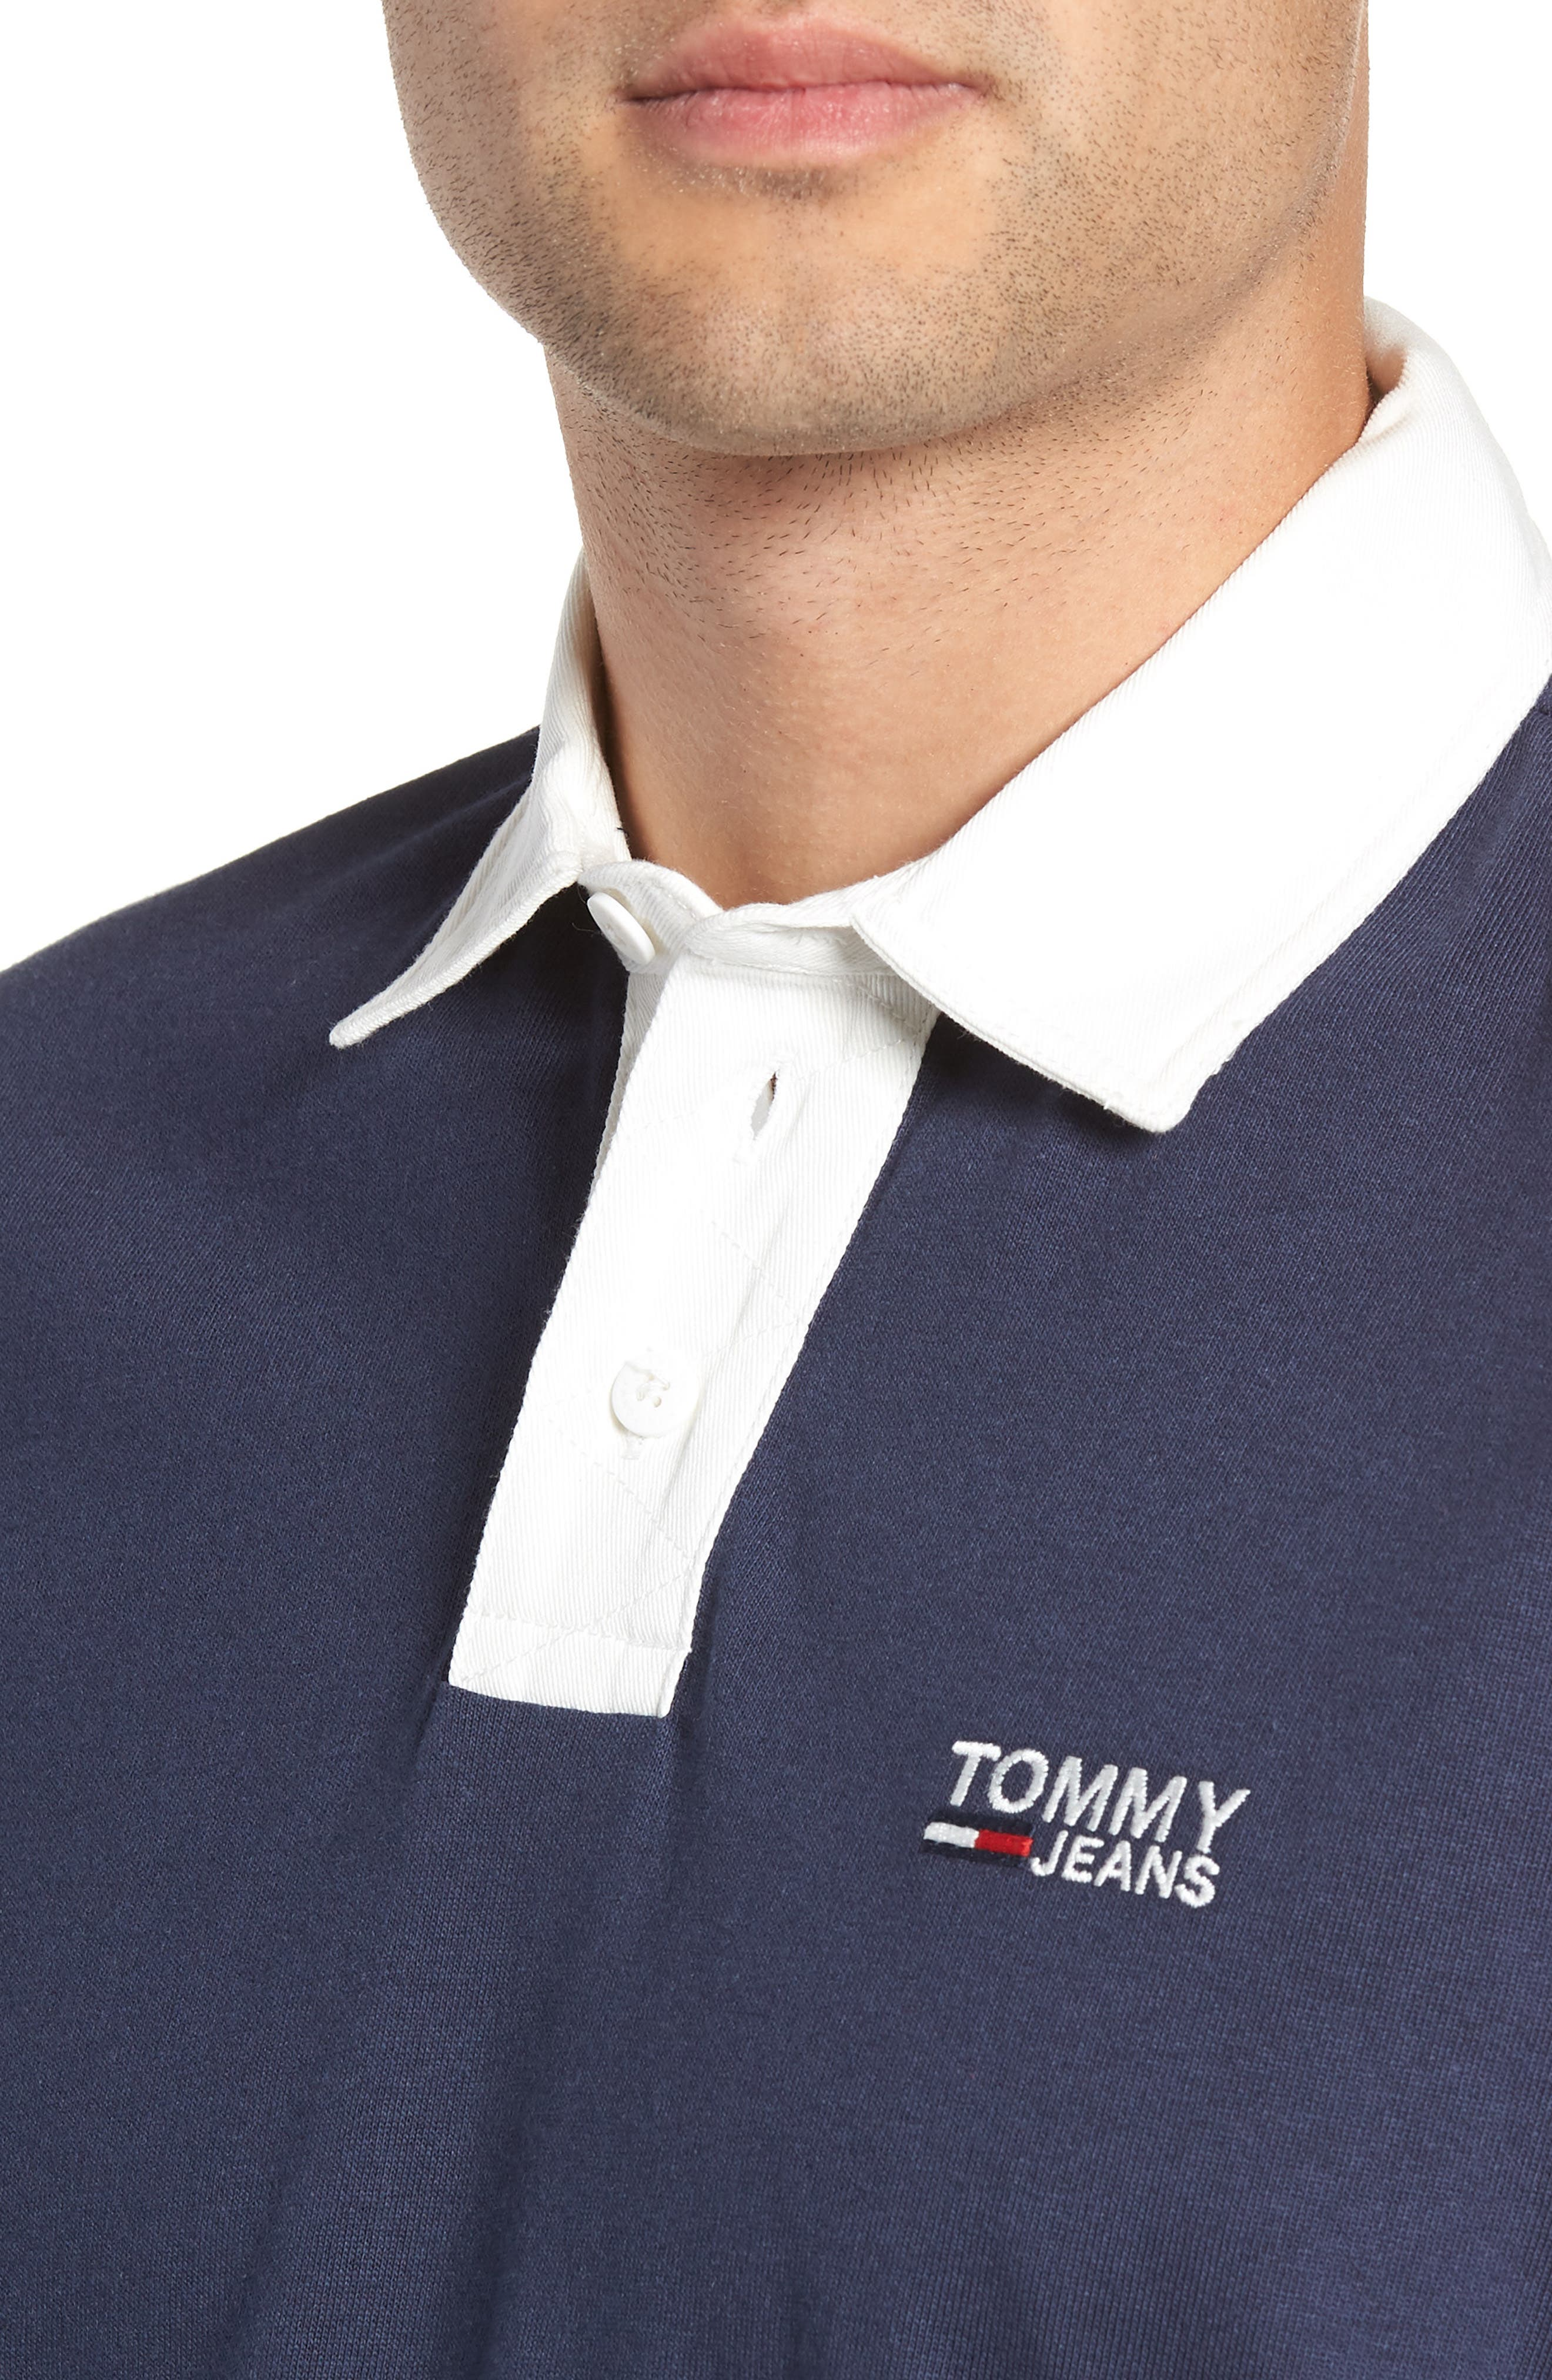 TJM Essential Rugby Shirt,                             Alternate thumbnail 4, color,                             BLACK IRIS